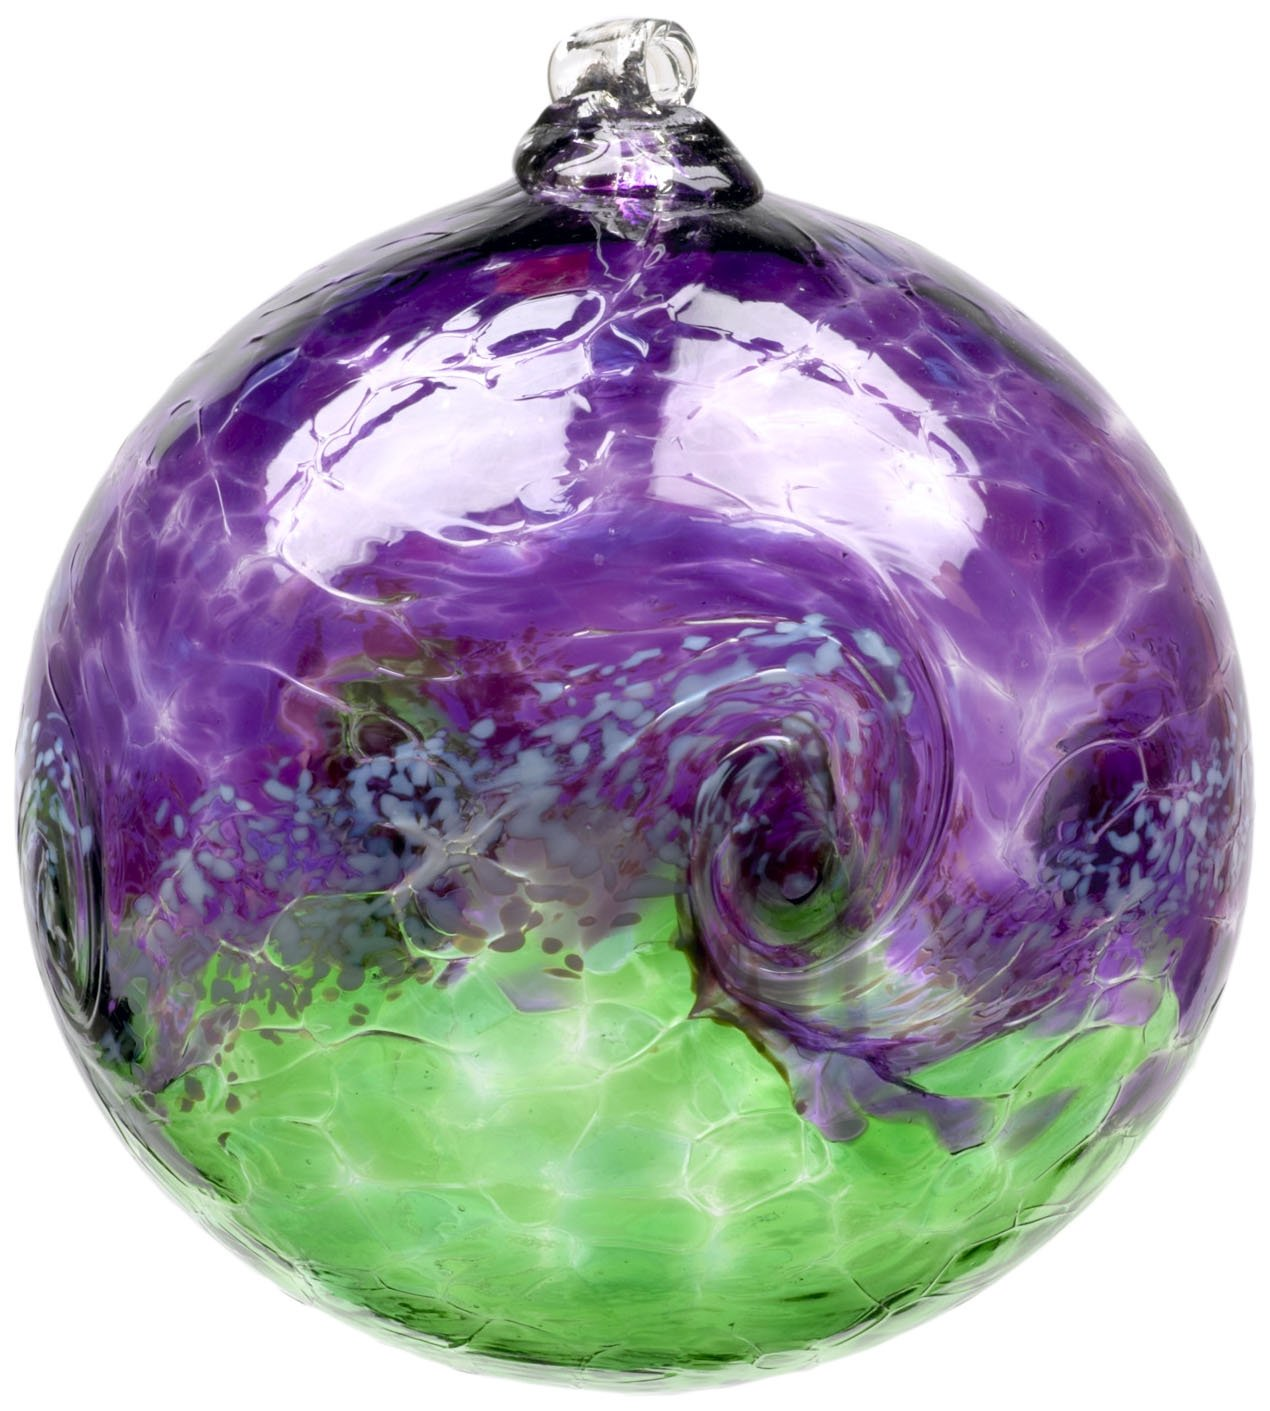 Kitras 3-Inch Van Glow Ball, Purple/Green